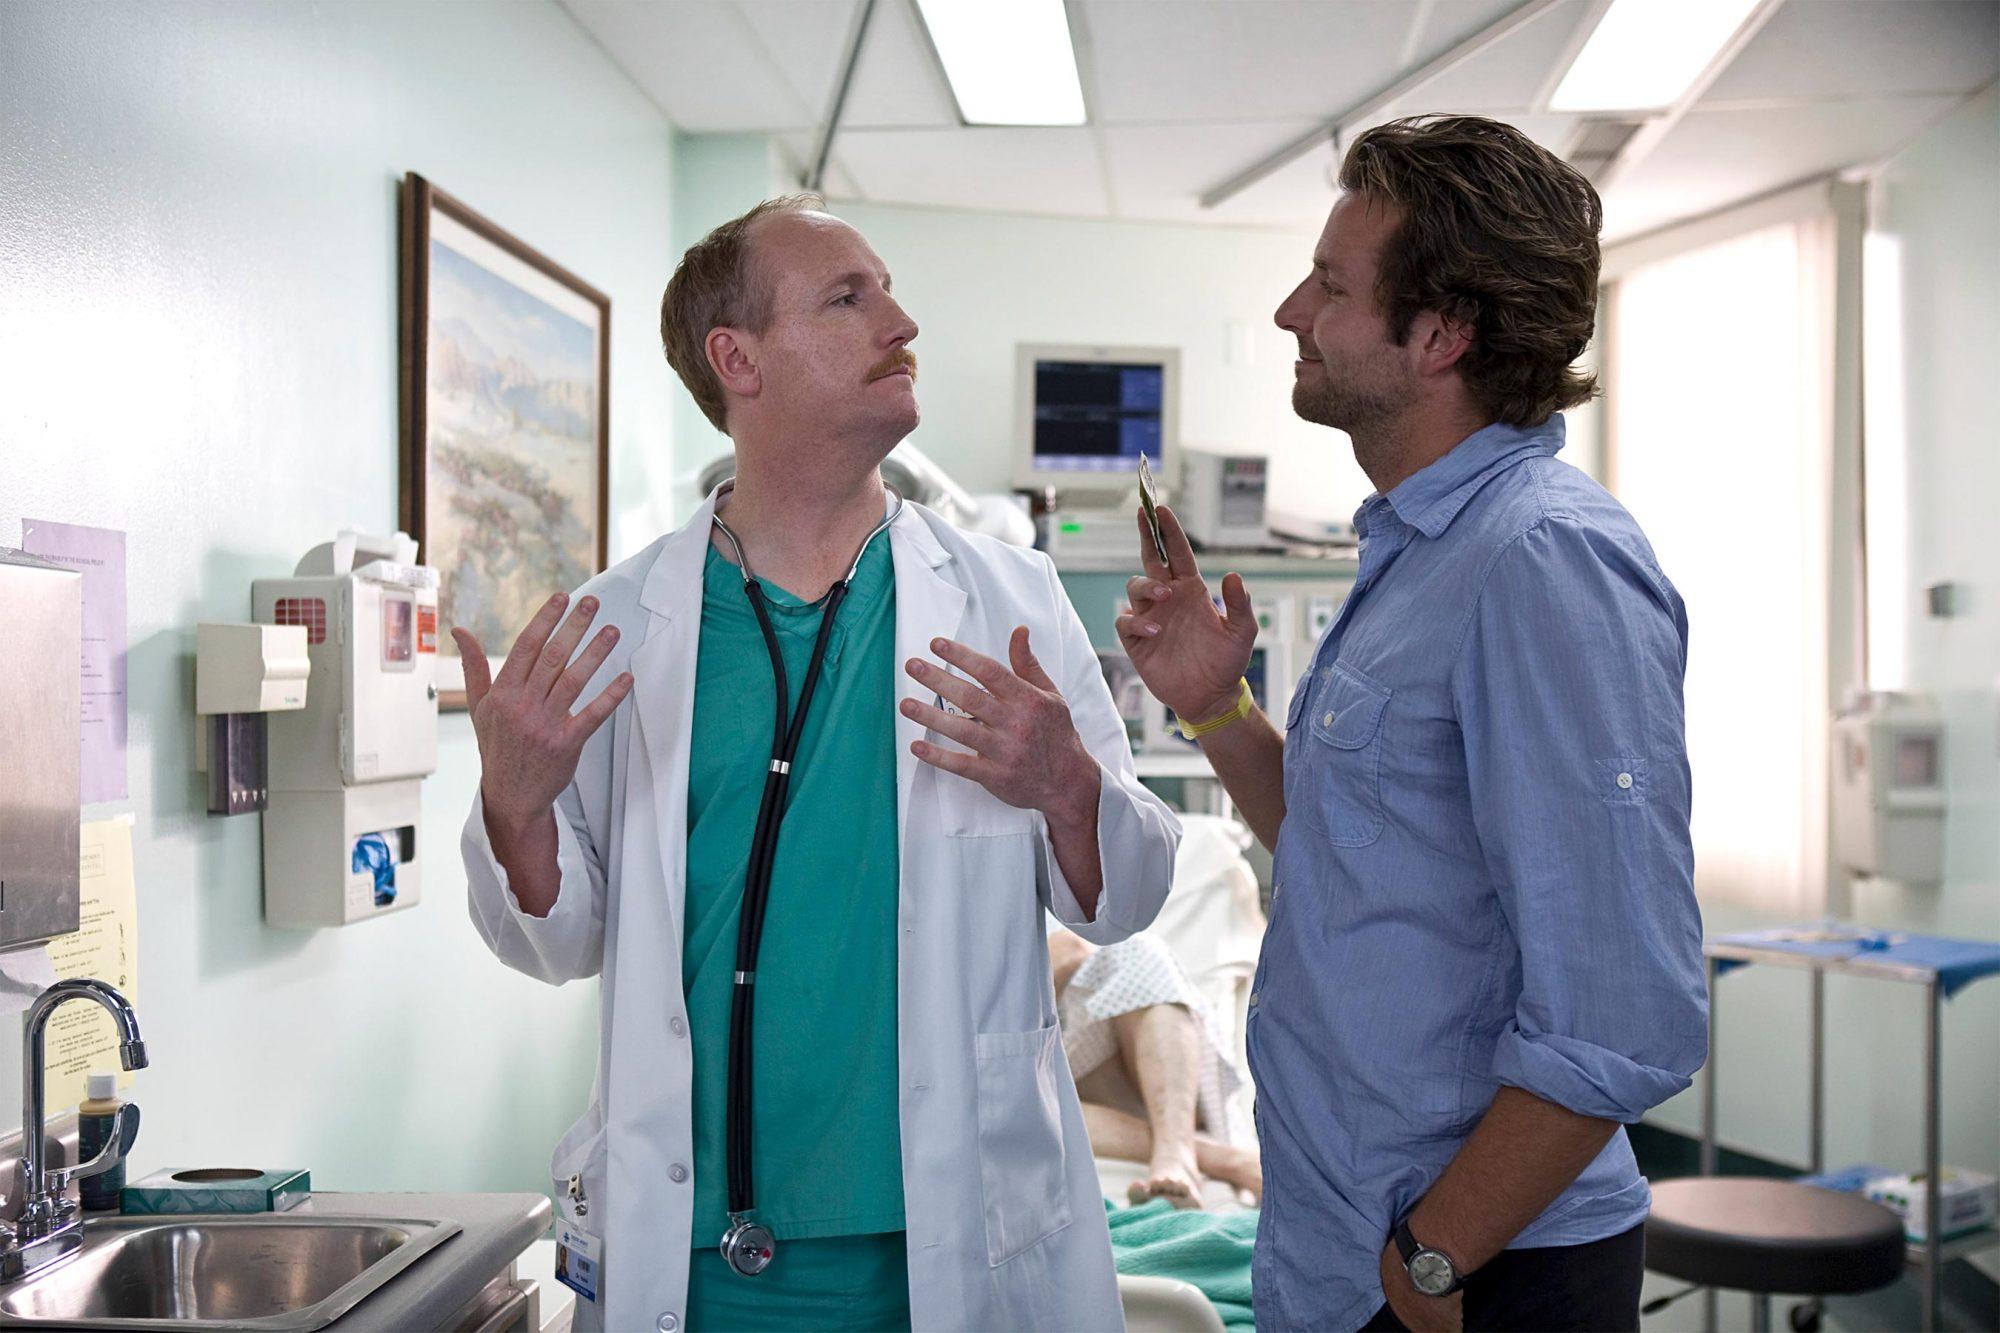 THE HANGOVER, from left: Matt Walsh, Bradley Cooper, 2009. Ph: Frank Masi/©Warner Bros./Courtesy Everett Collection